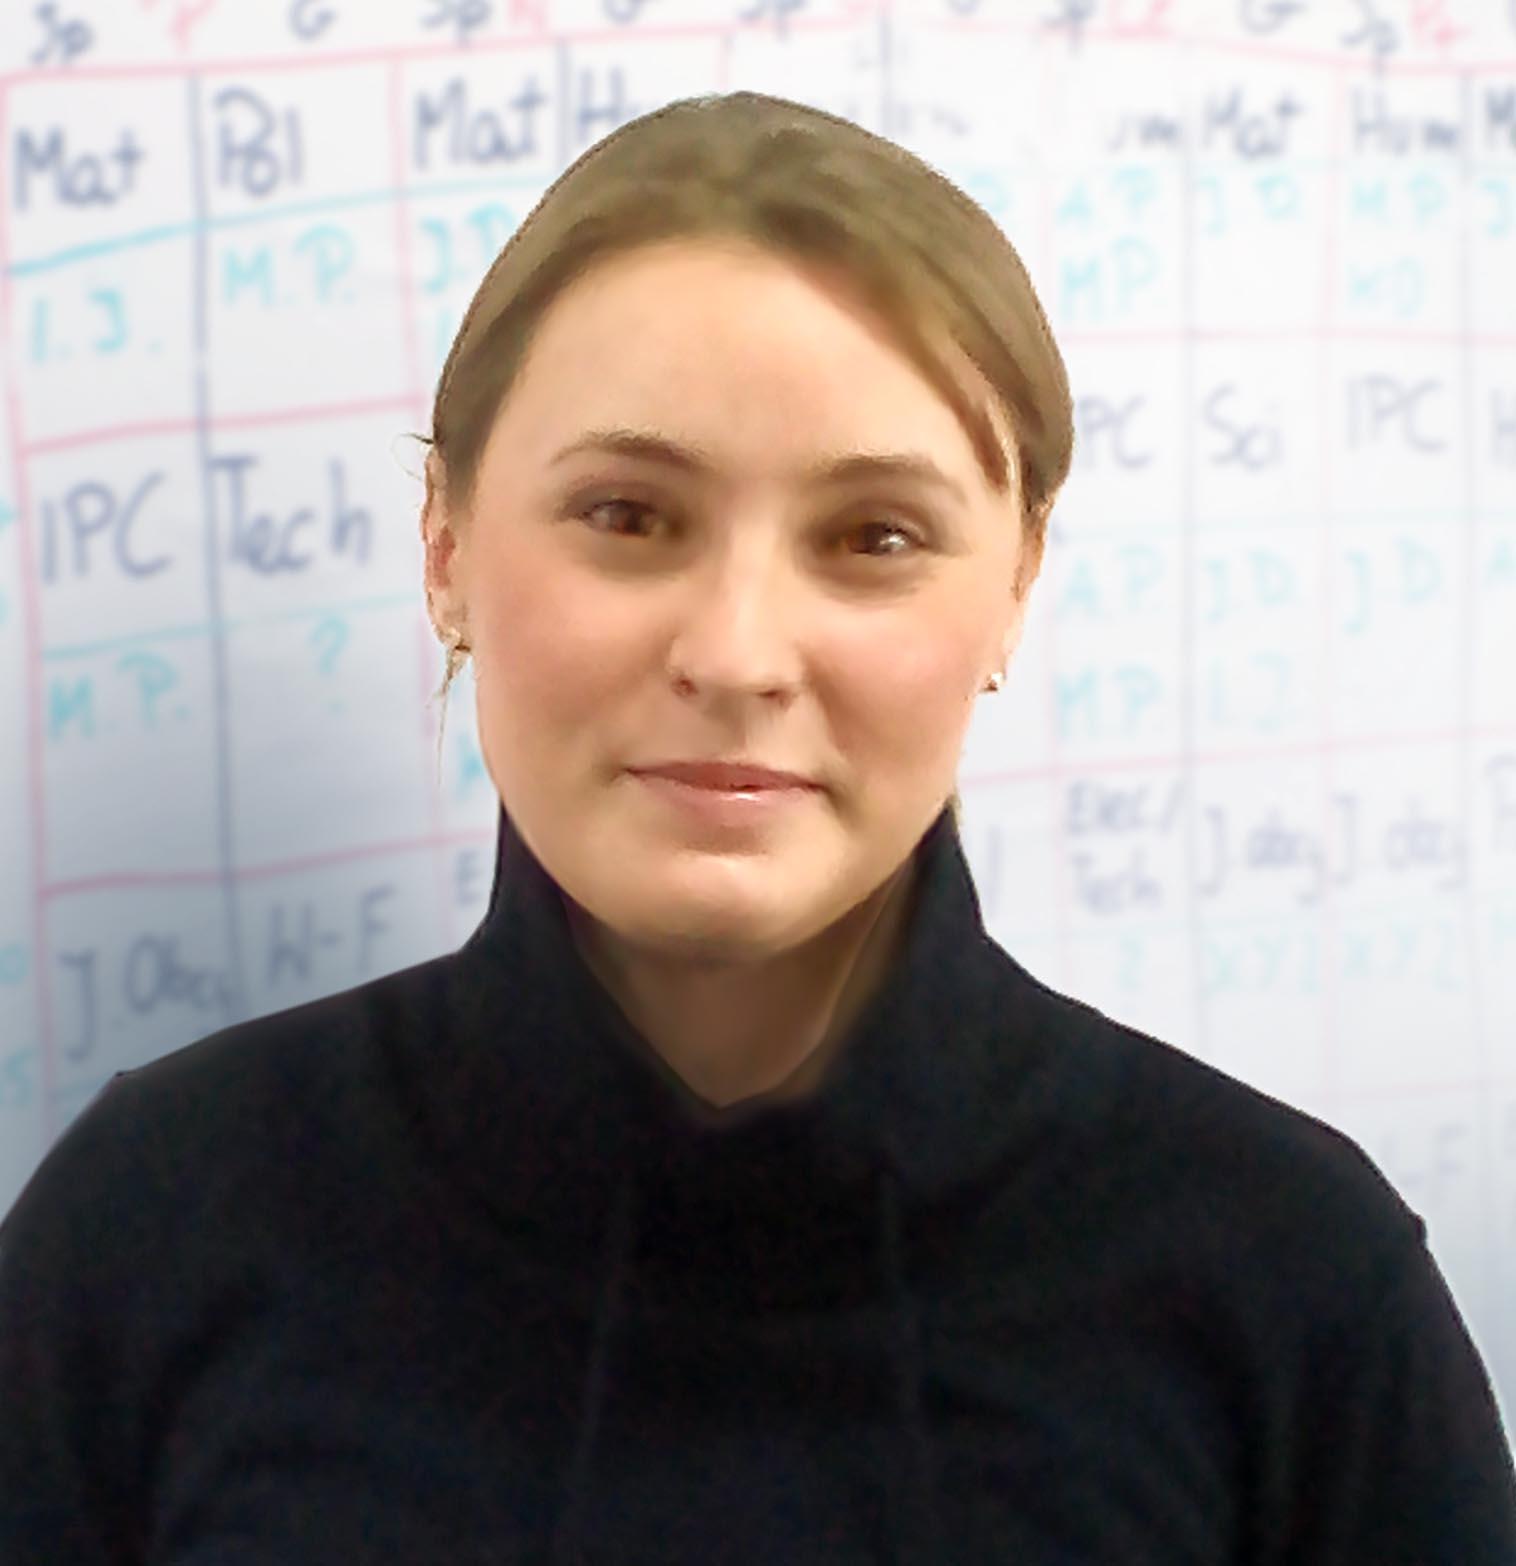 Ewelina Czaplicka